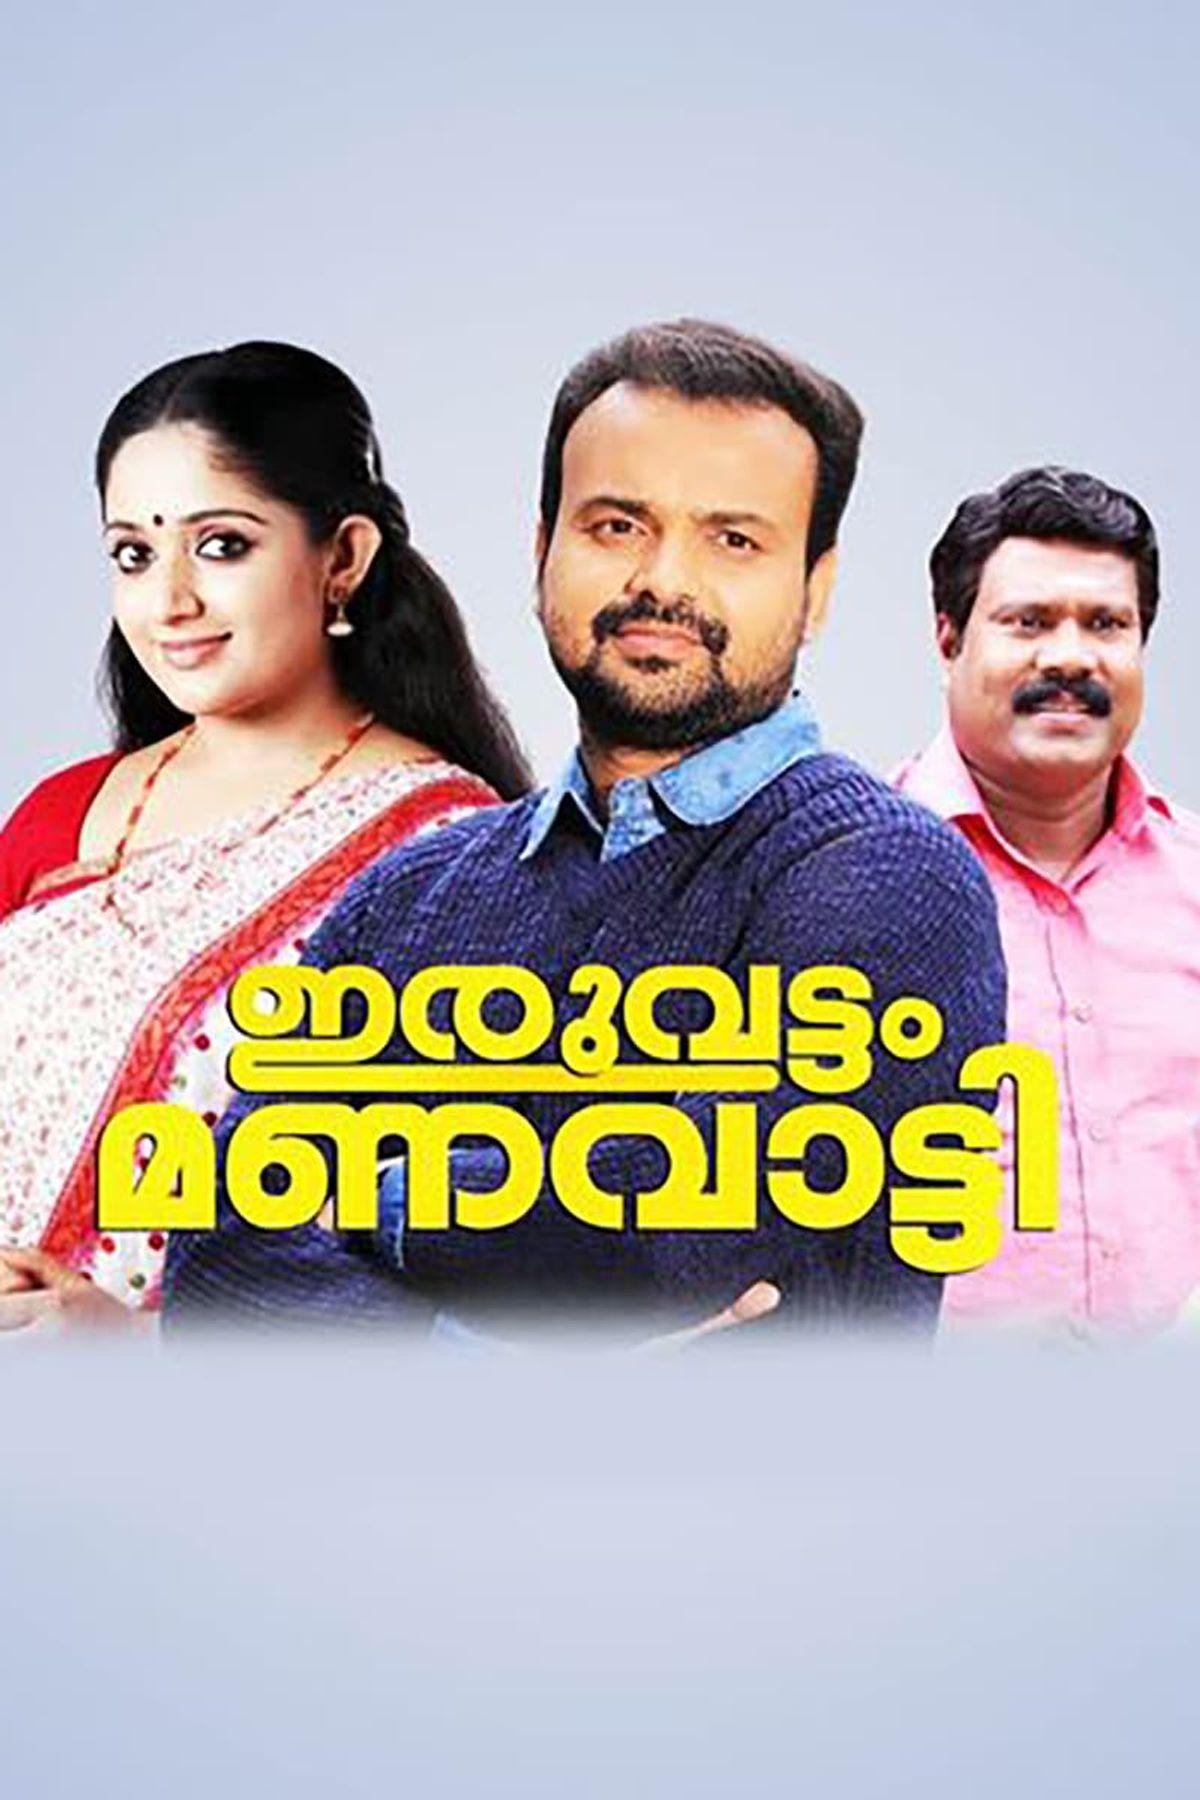 Kalaranjini Best Movies, TV Shows and Web Series List